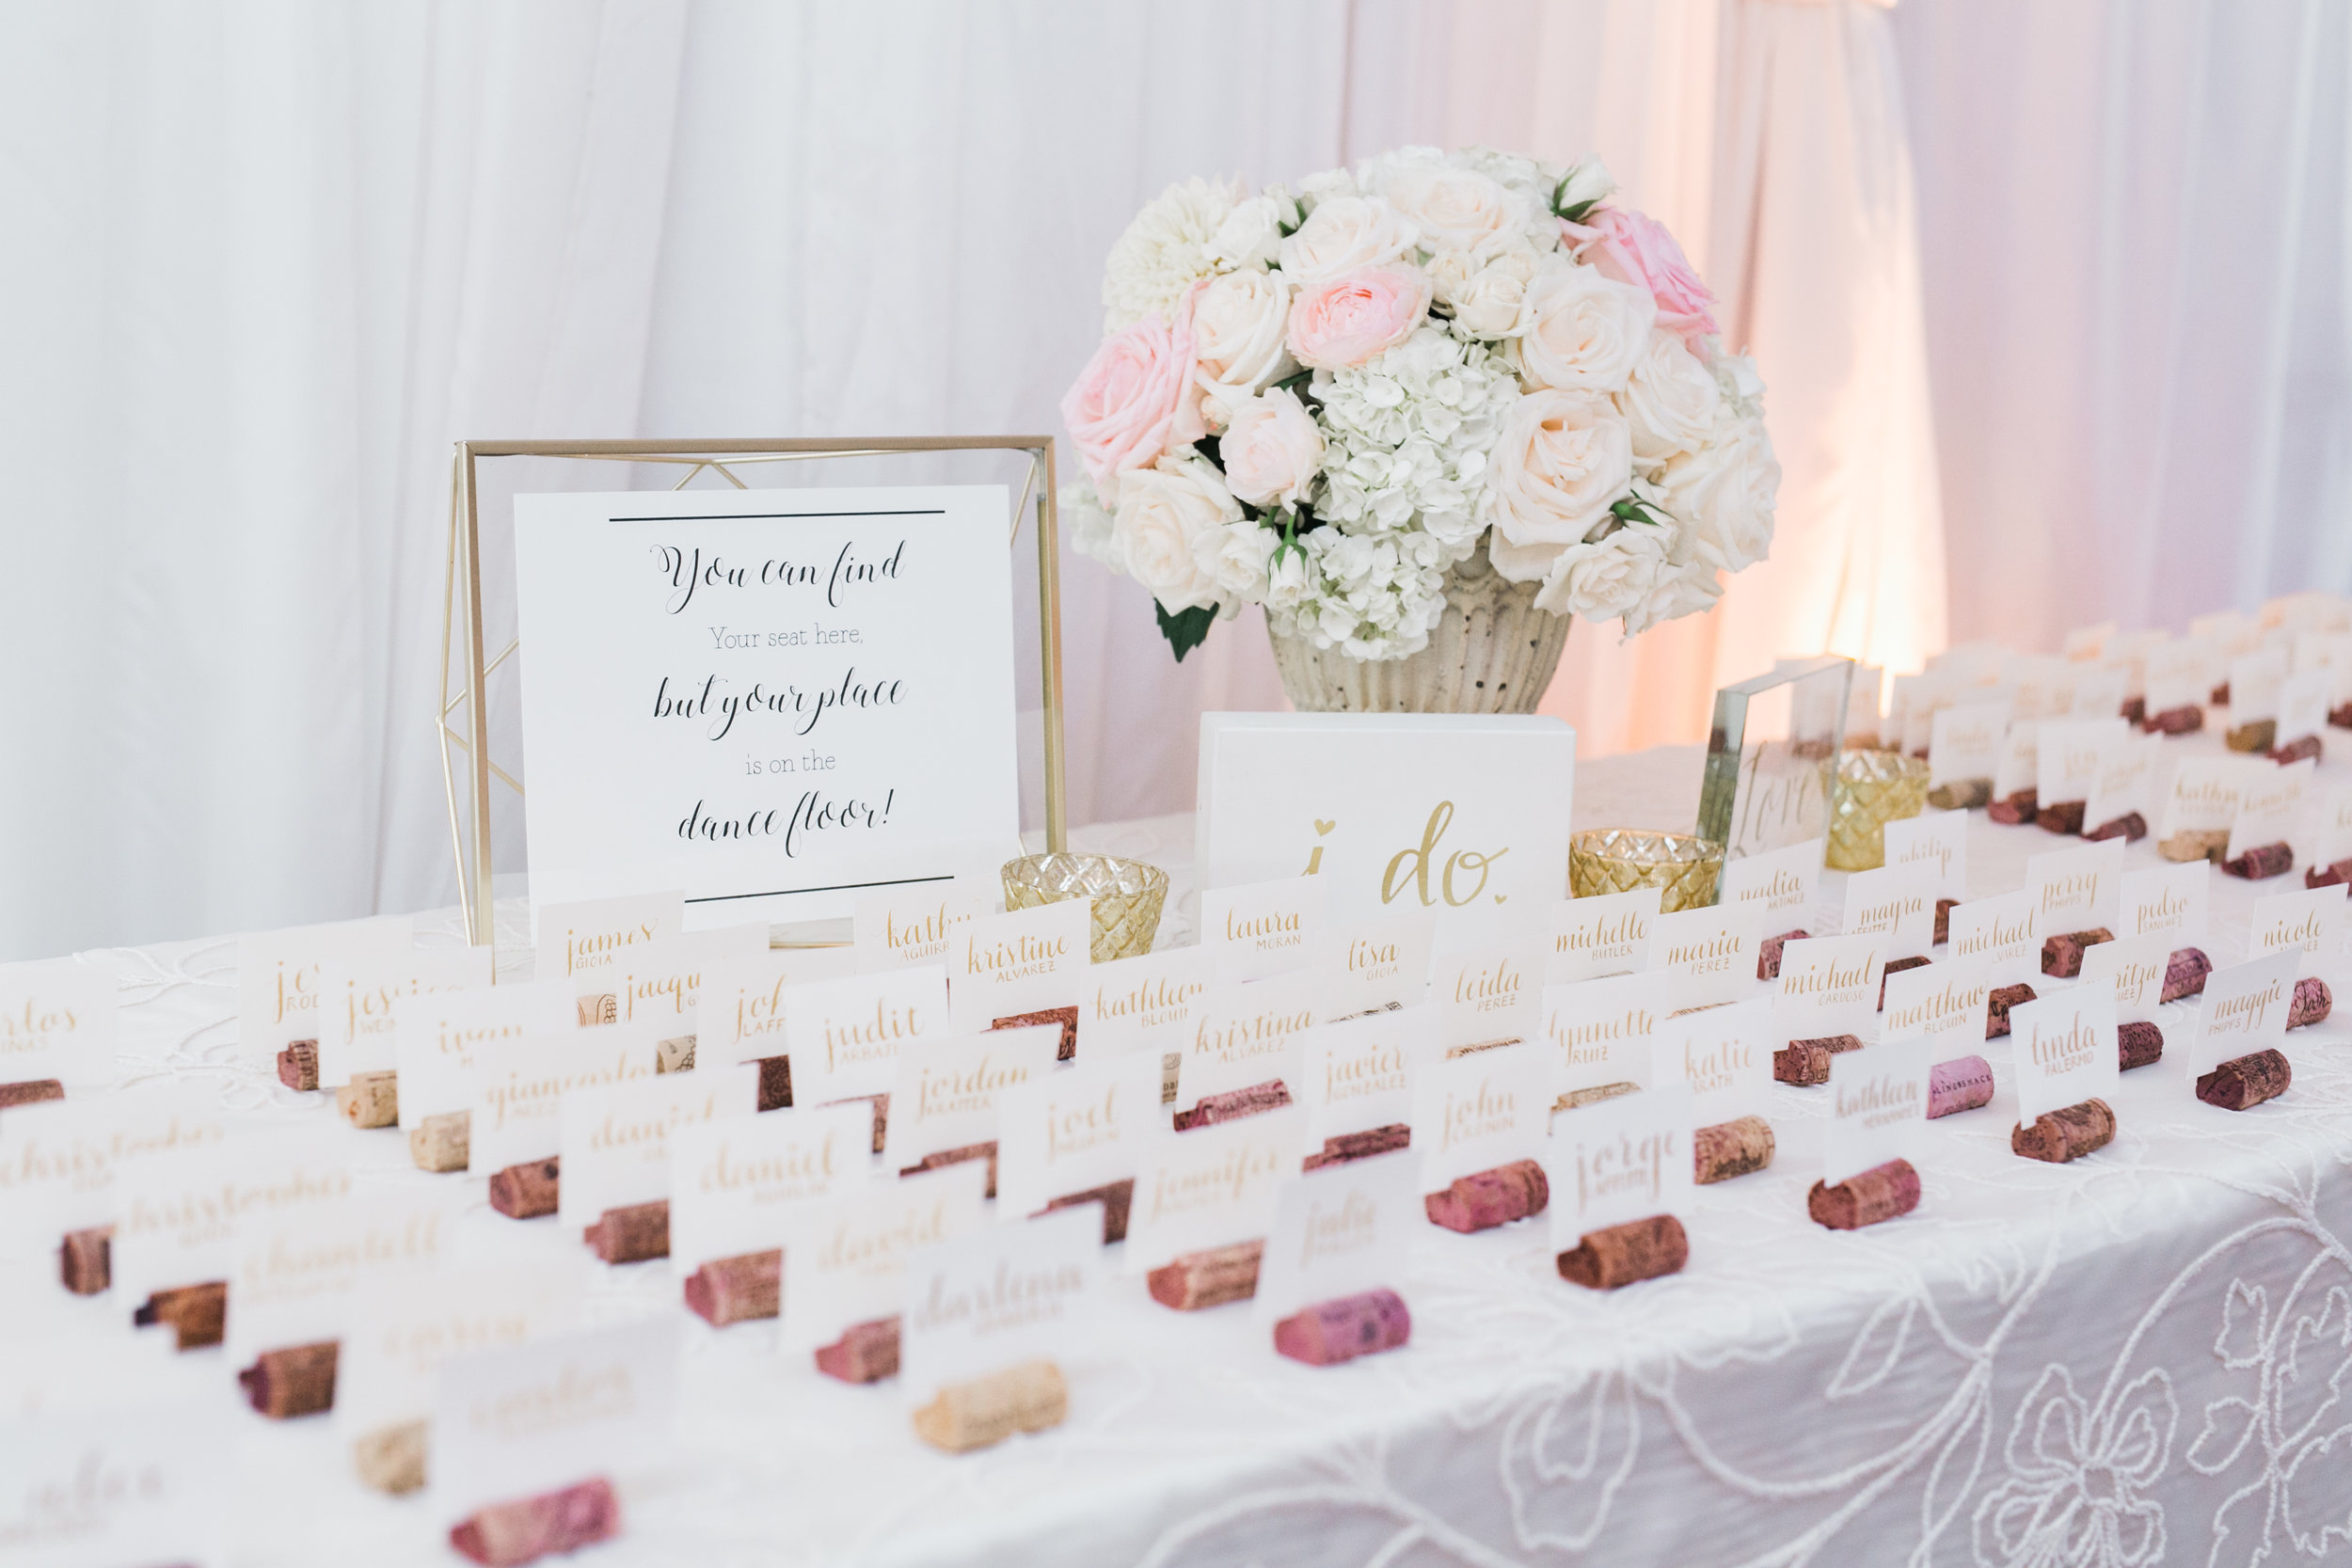 jenny-and-george-wedding-roque-events-meyerott-photography 1154.jpg